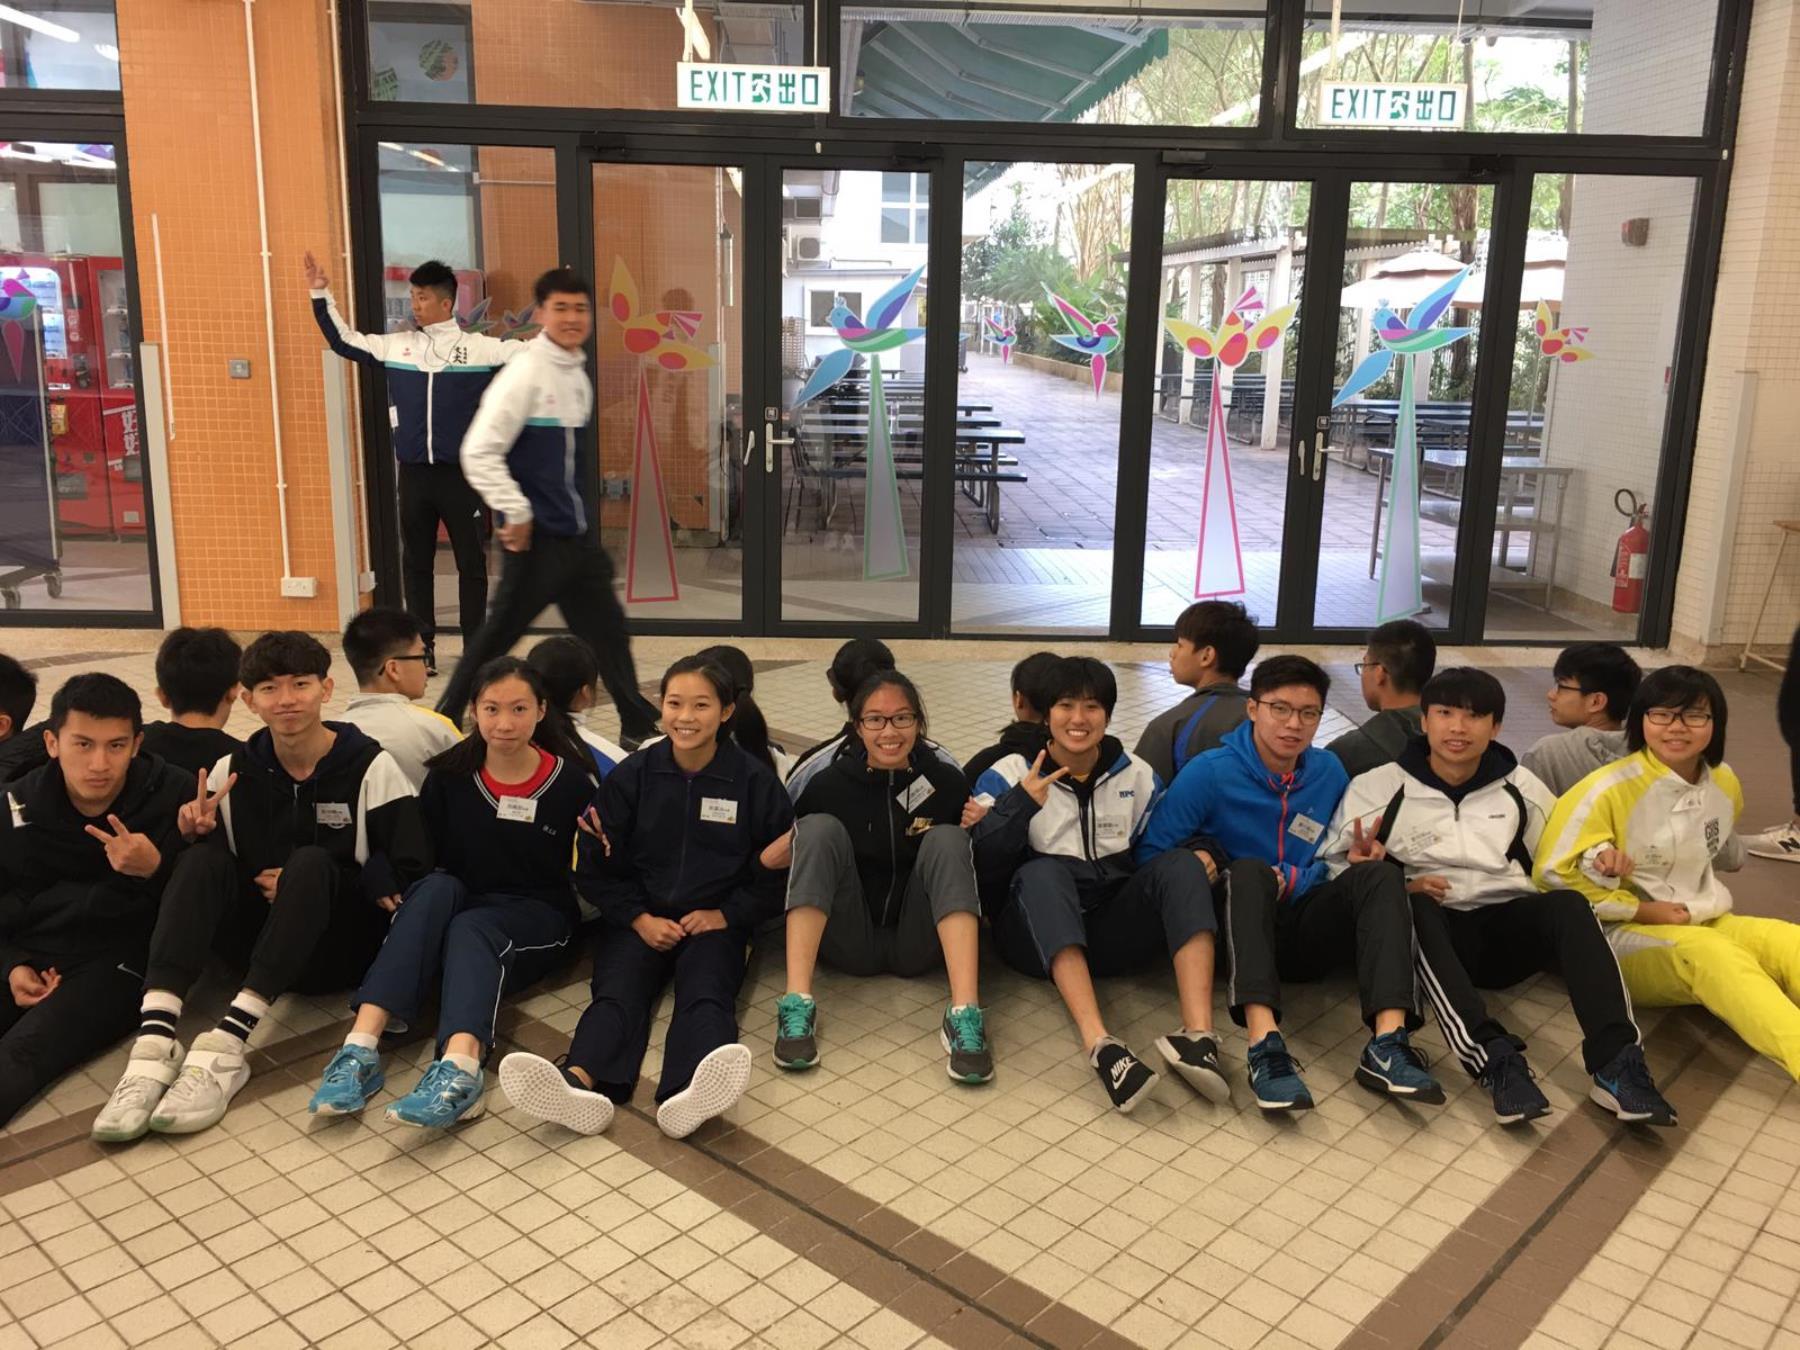 http://npc.edu.hk/sites/default/files/img_6497.jpg